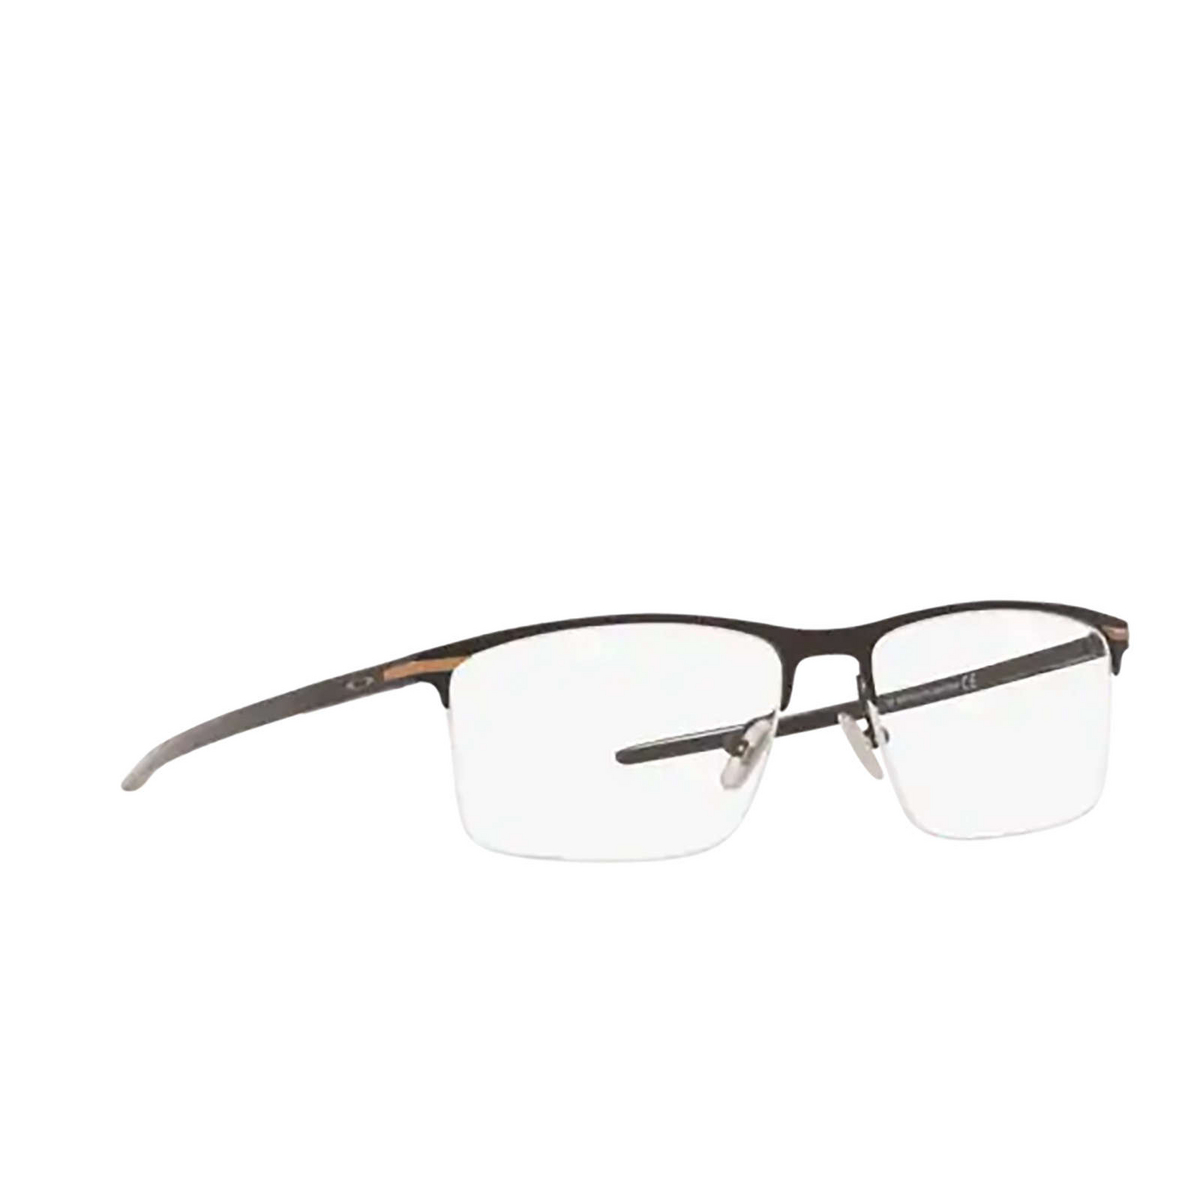 Oakley® Rectangle Eyeglasses: Tie Bar 0.5 OX5140 color Satin Black 514001 - three-quarters view.